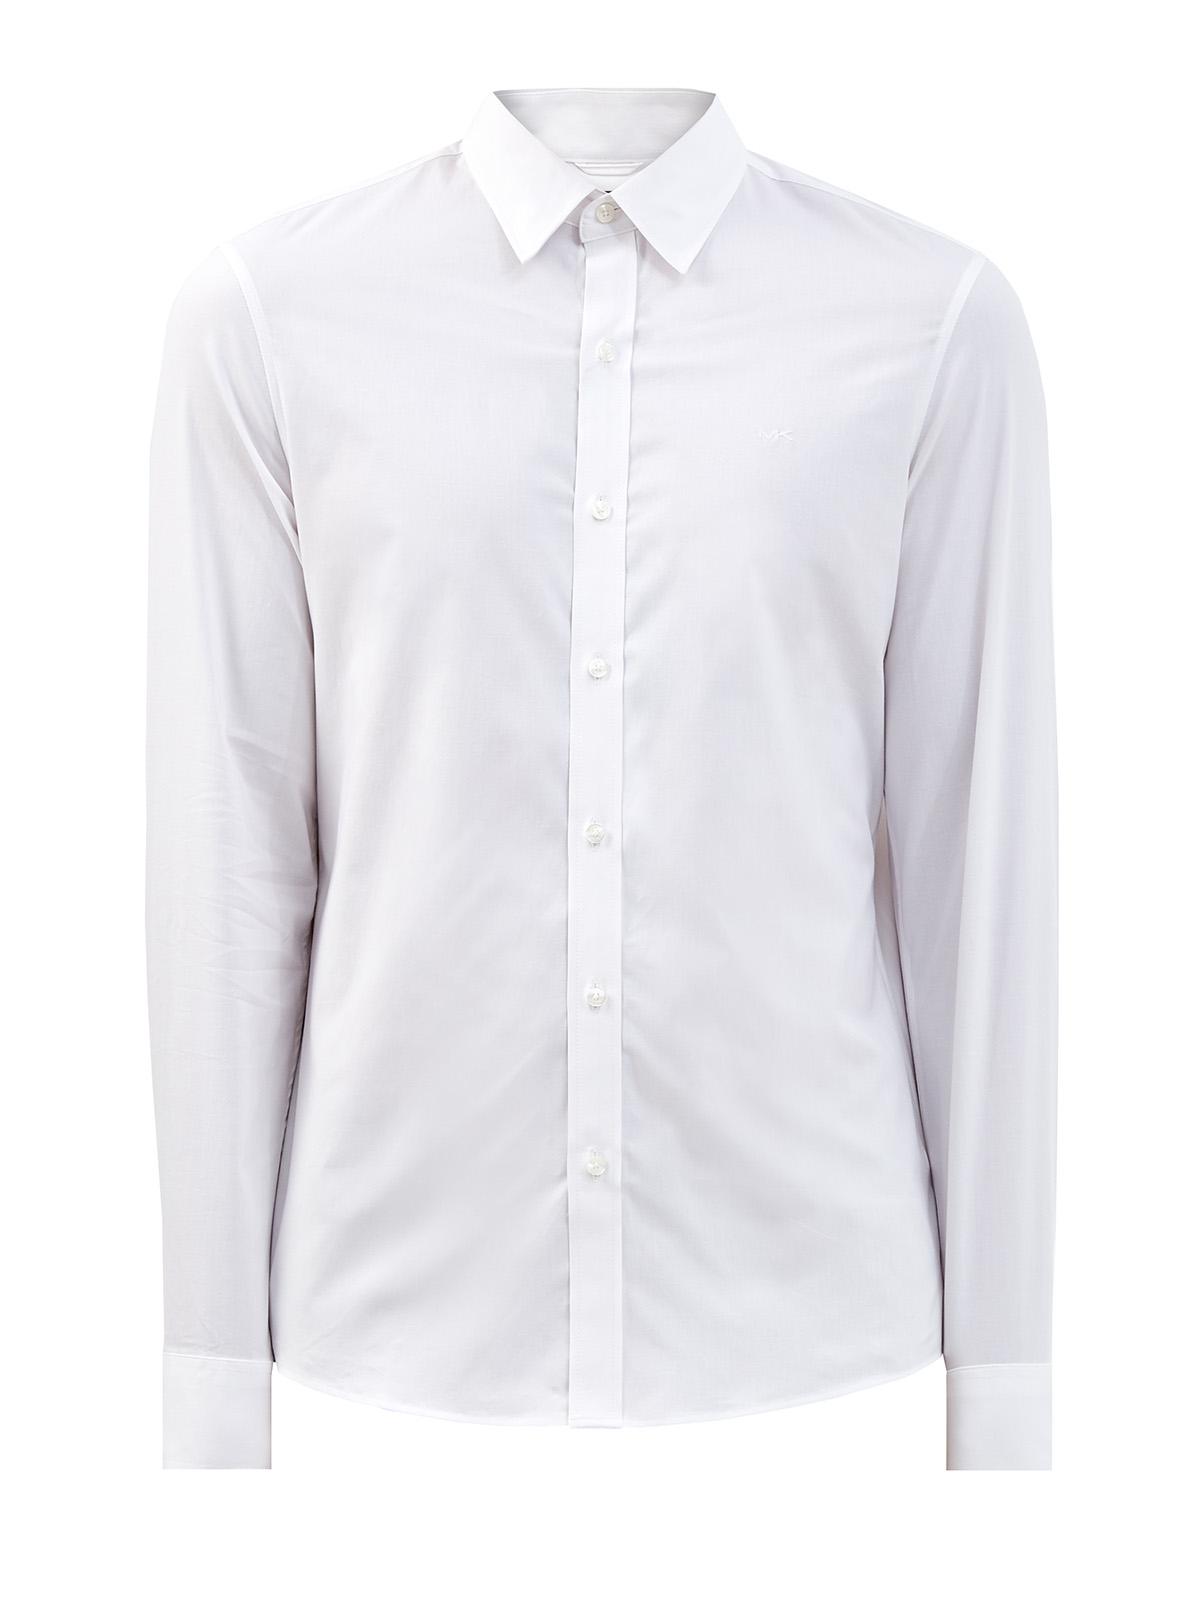 Рубашка в классическом стиле из эластичного поплина